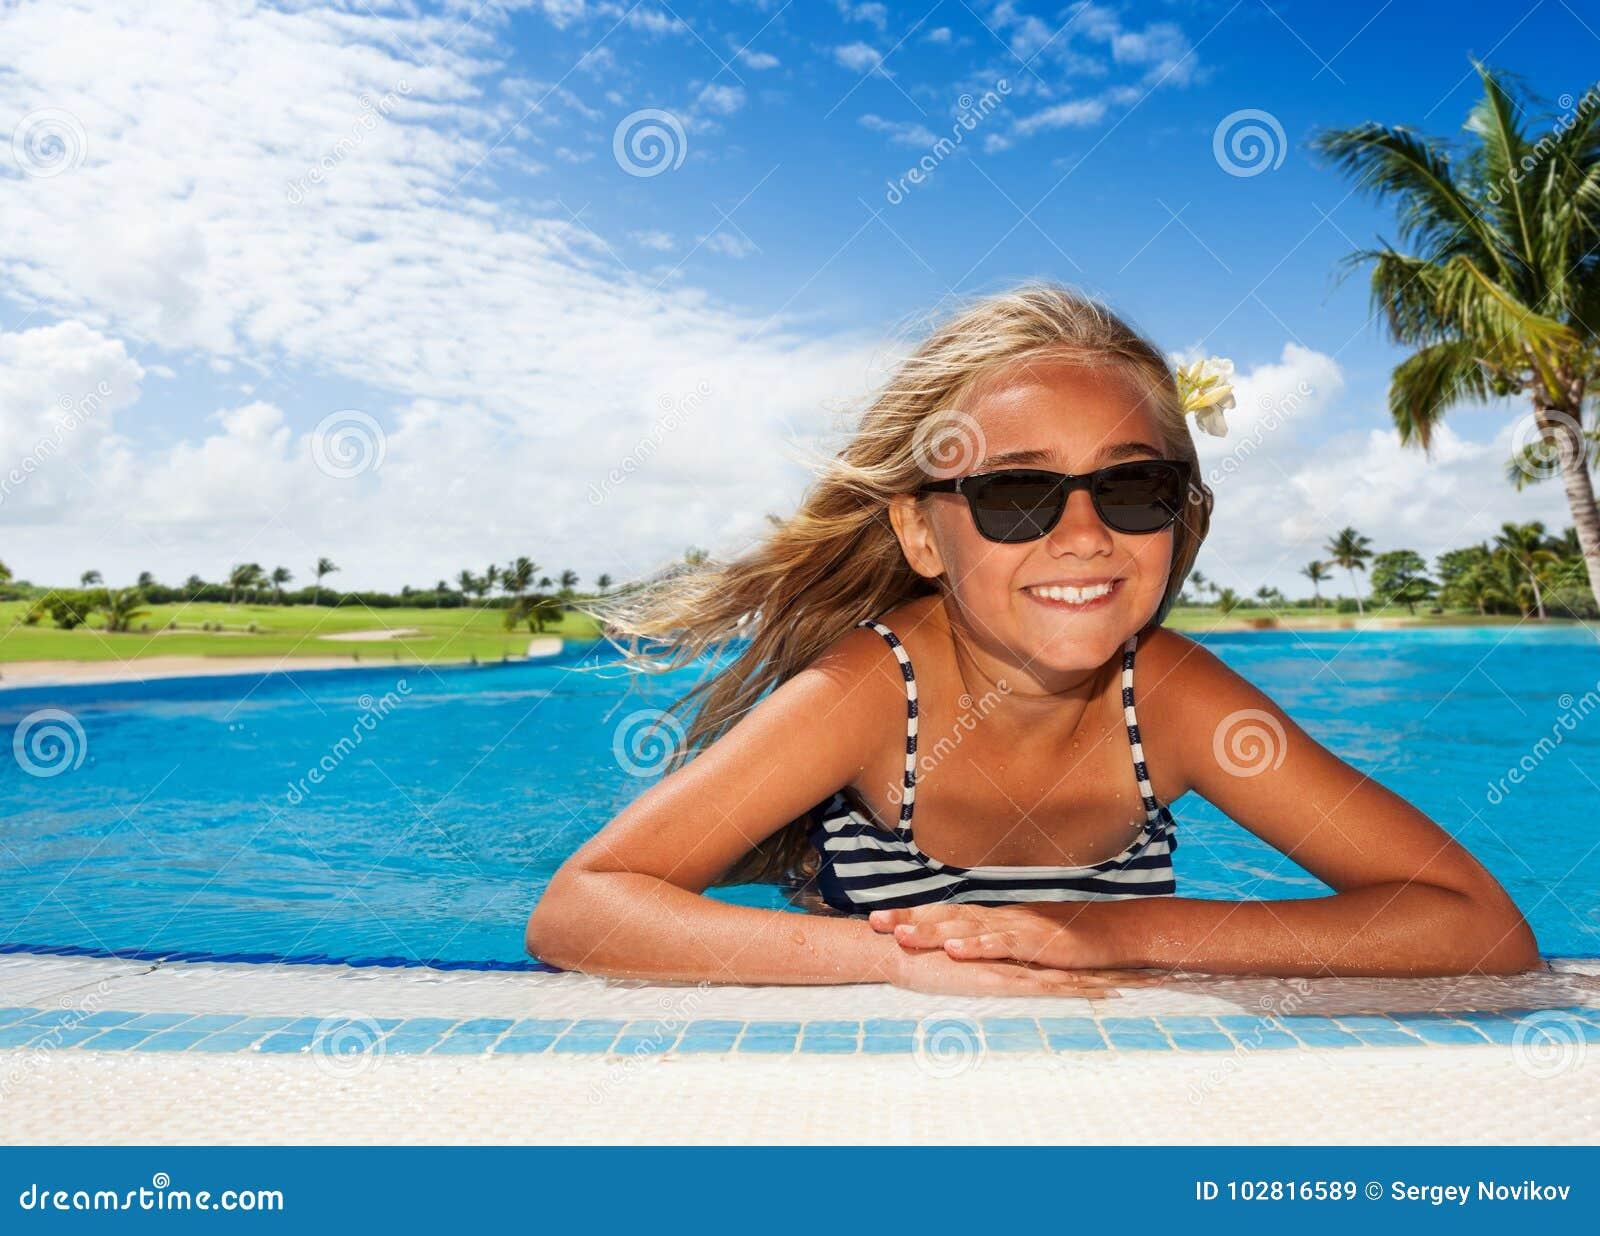 sunbathing girls nude teen